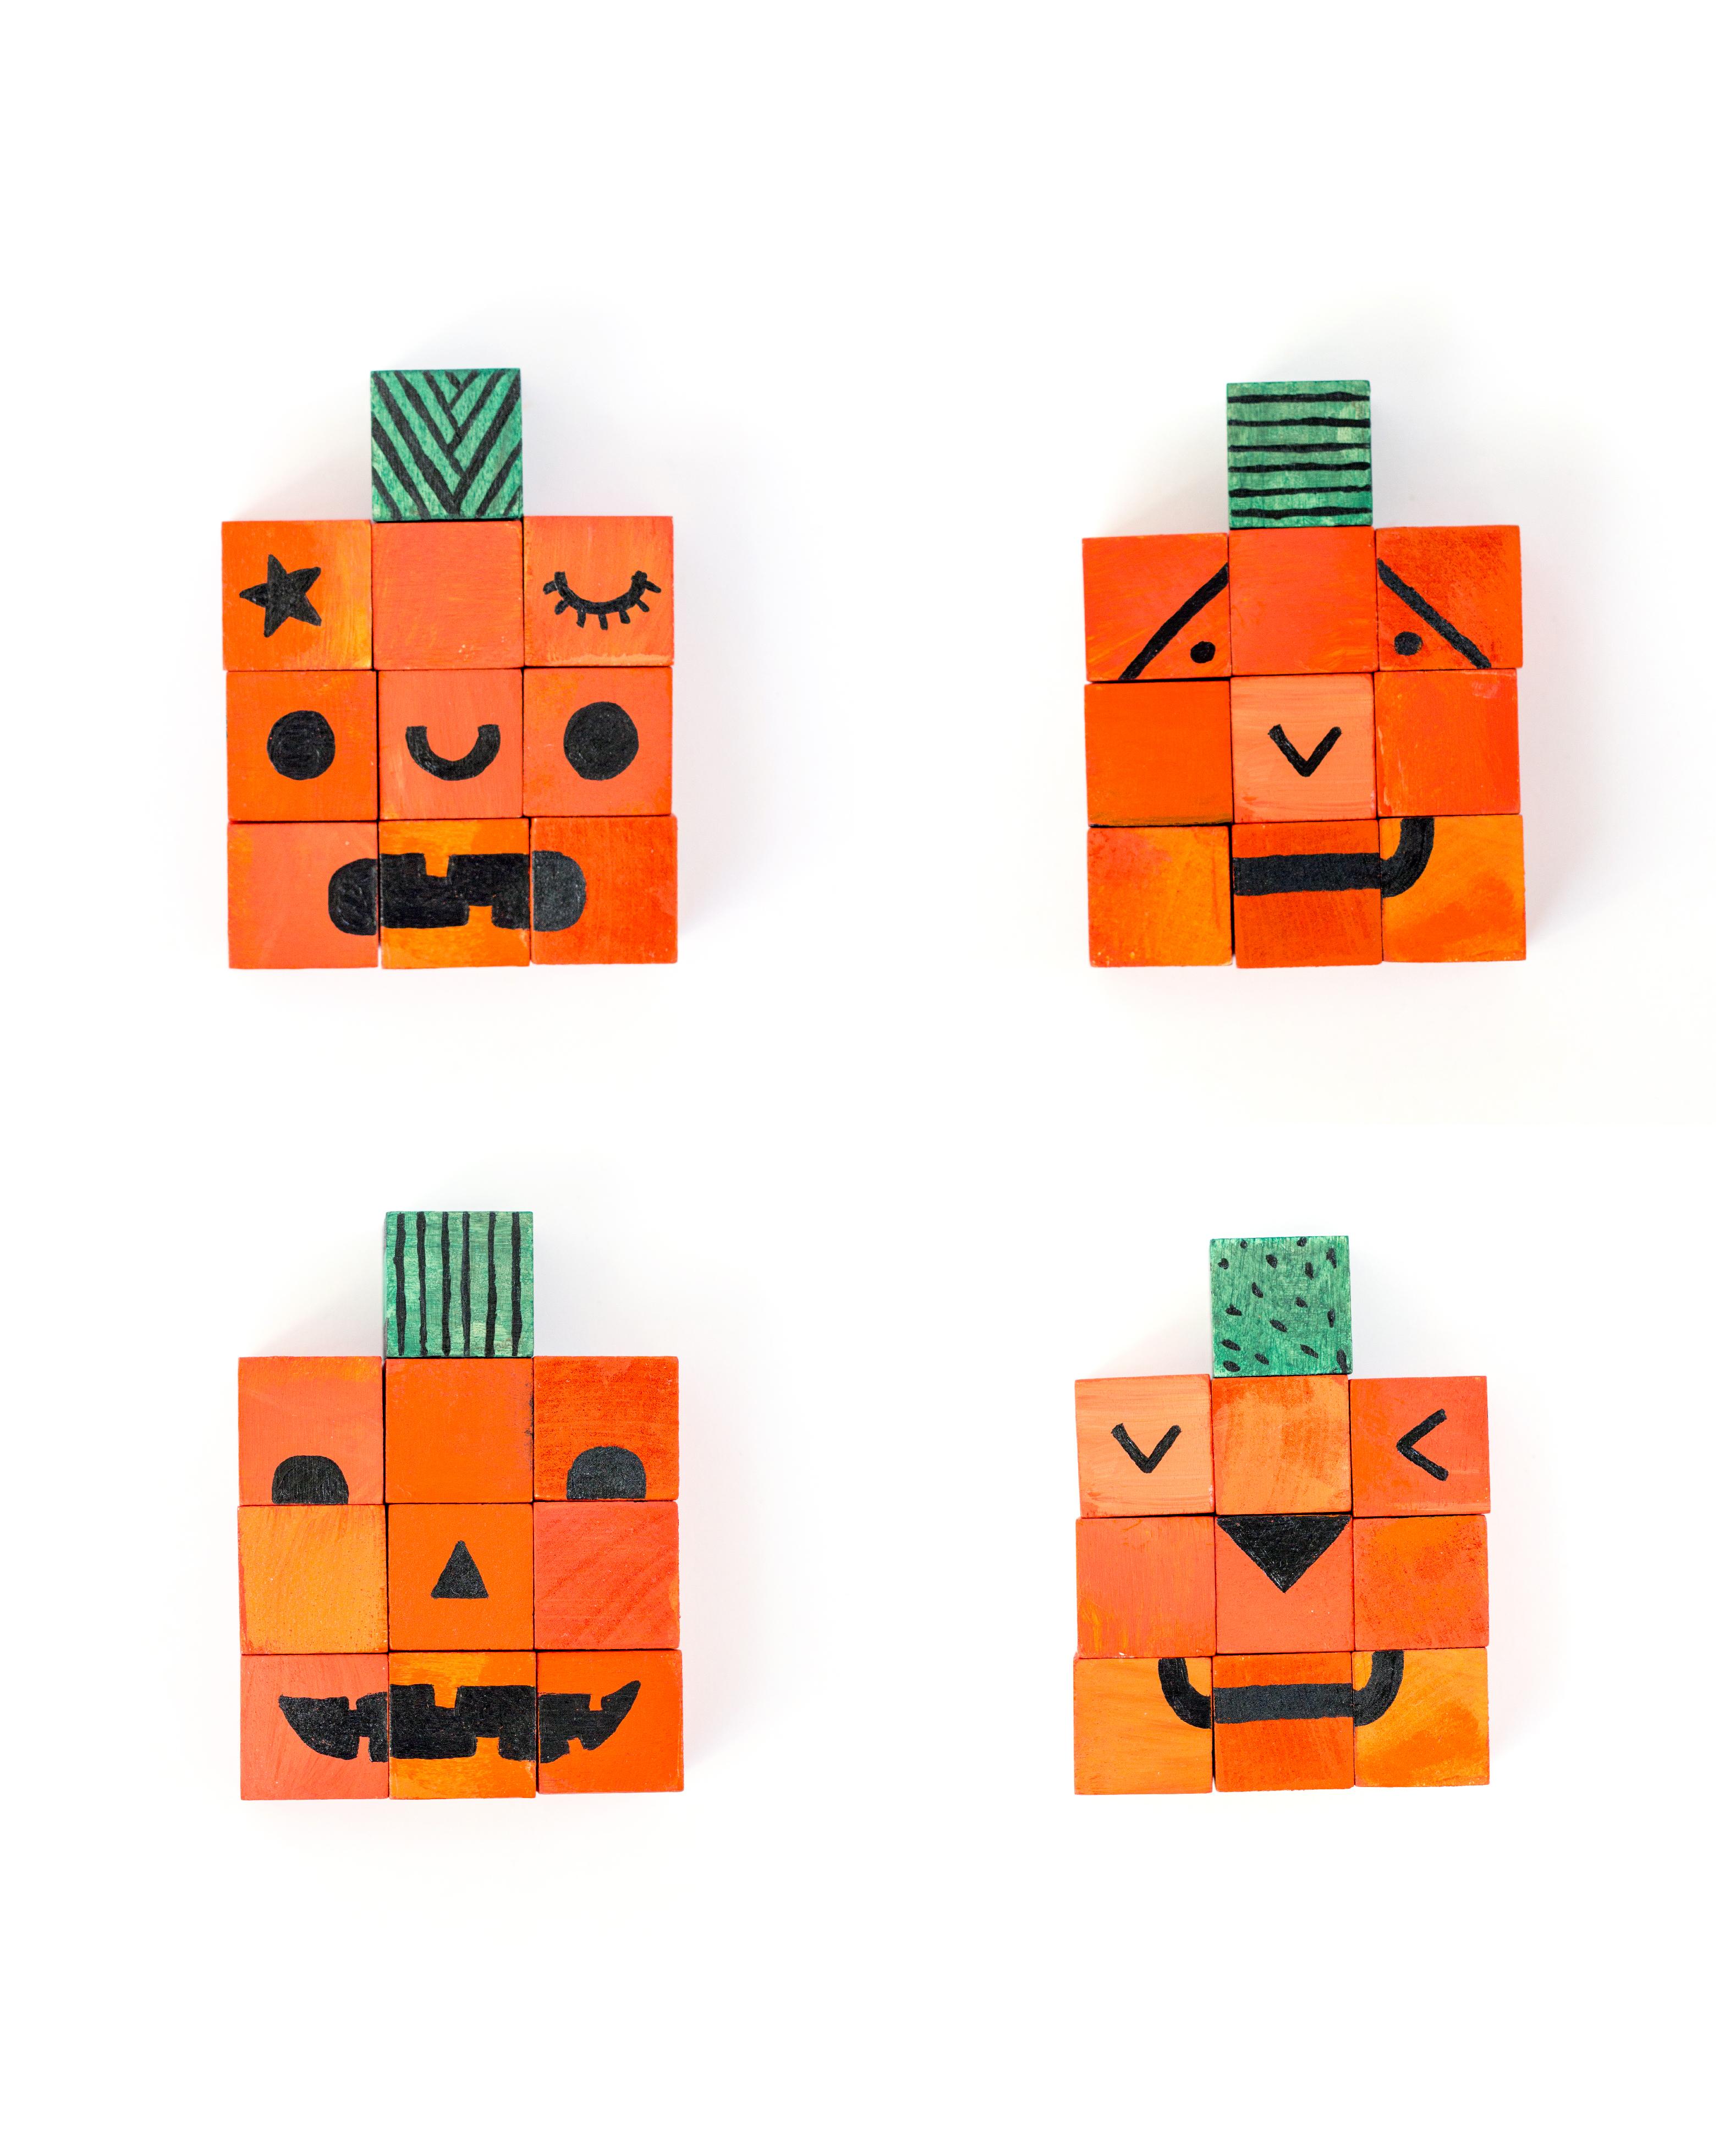 Jack-o-lantern Puzzle Blocks // www.deliacreates.com